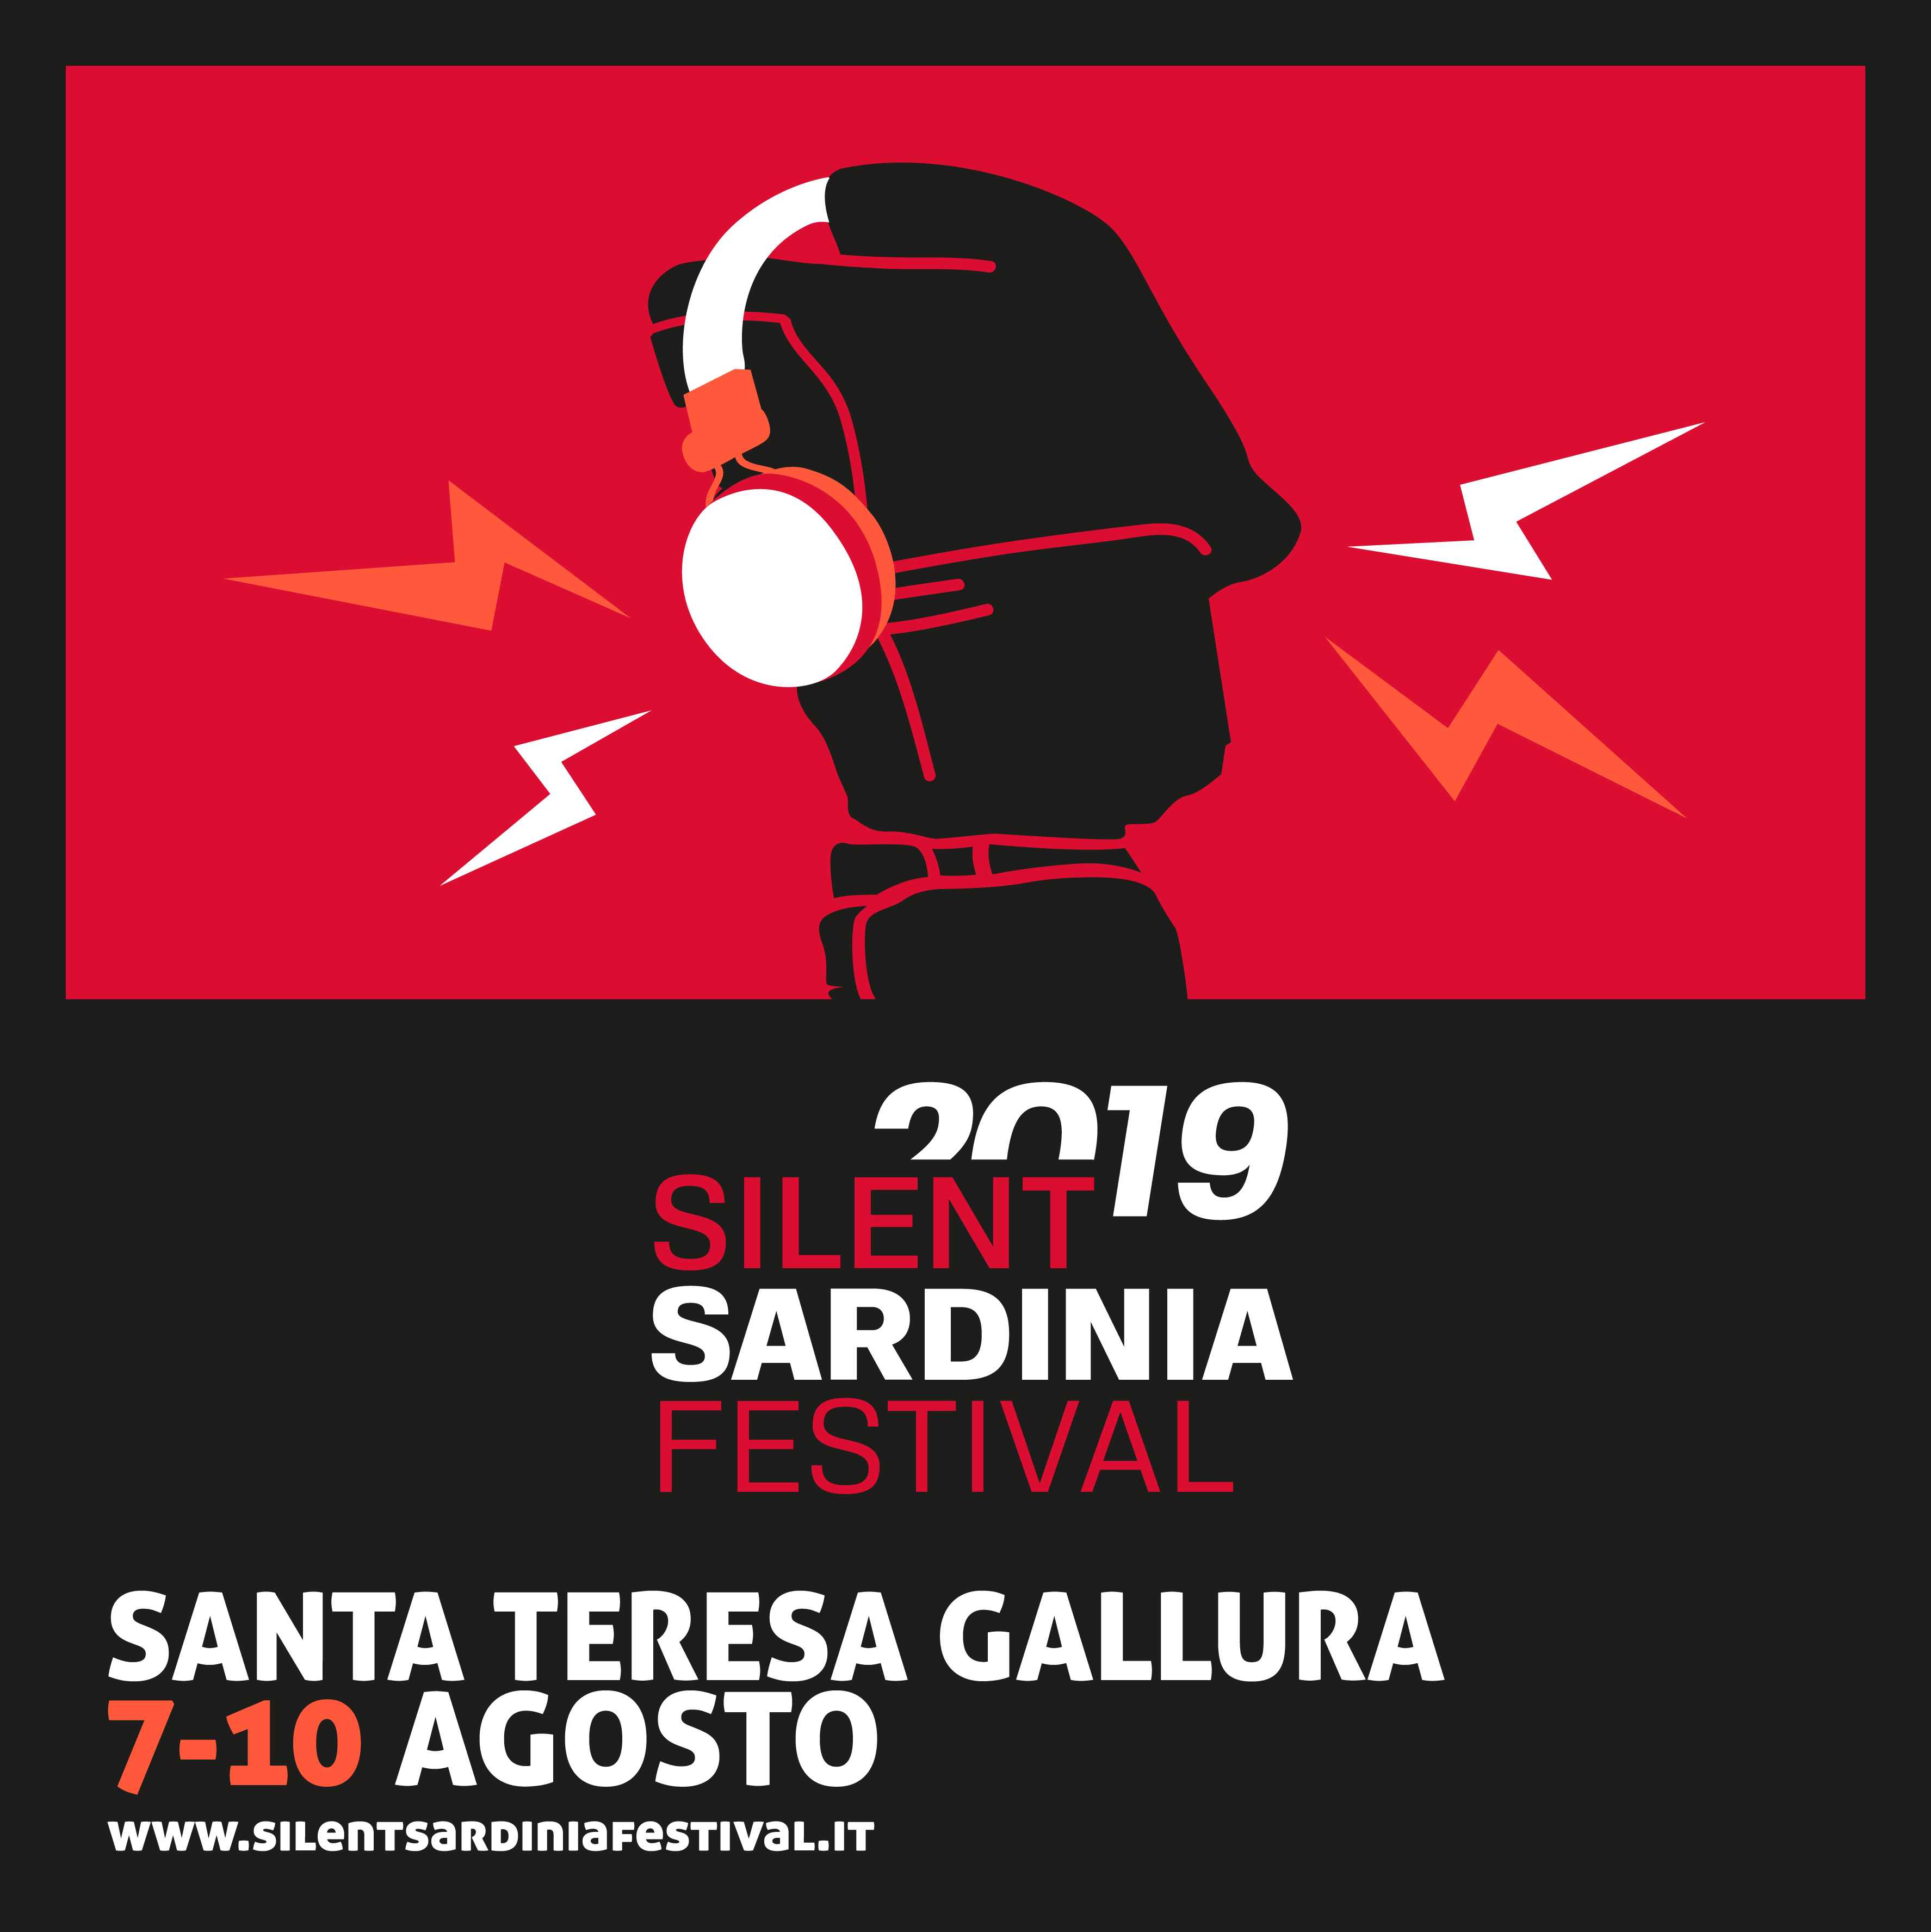 SILENT SARDINAI FESTIVAL 2019